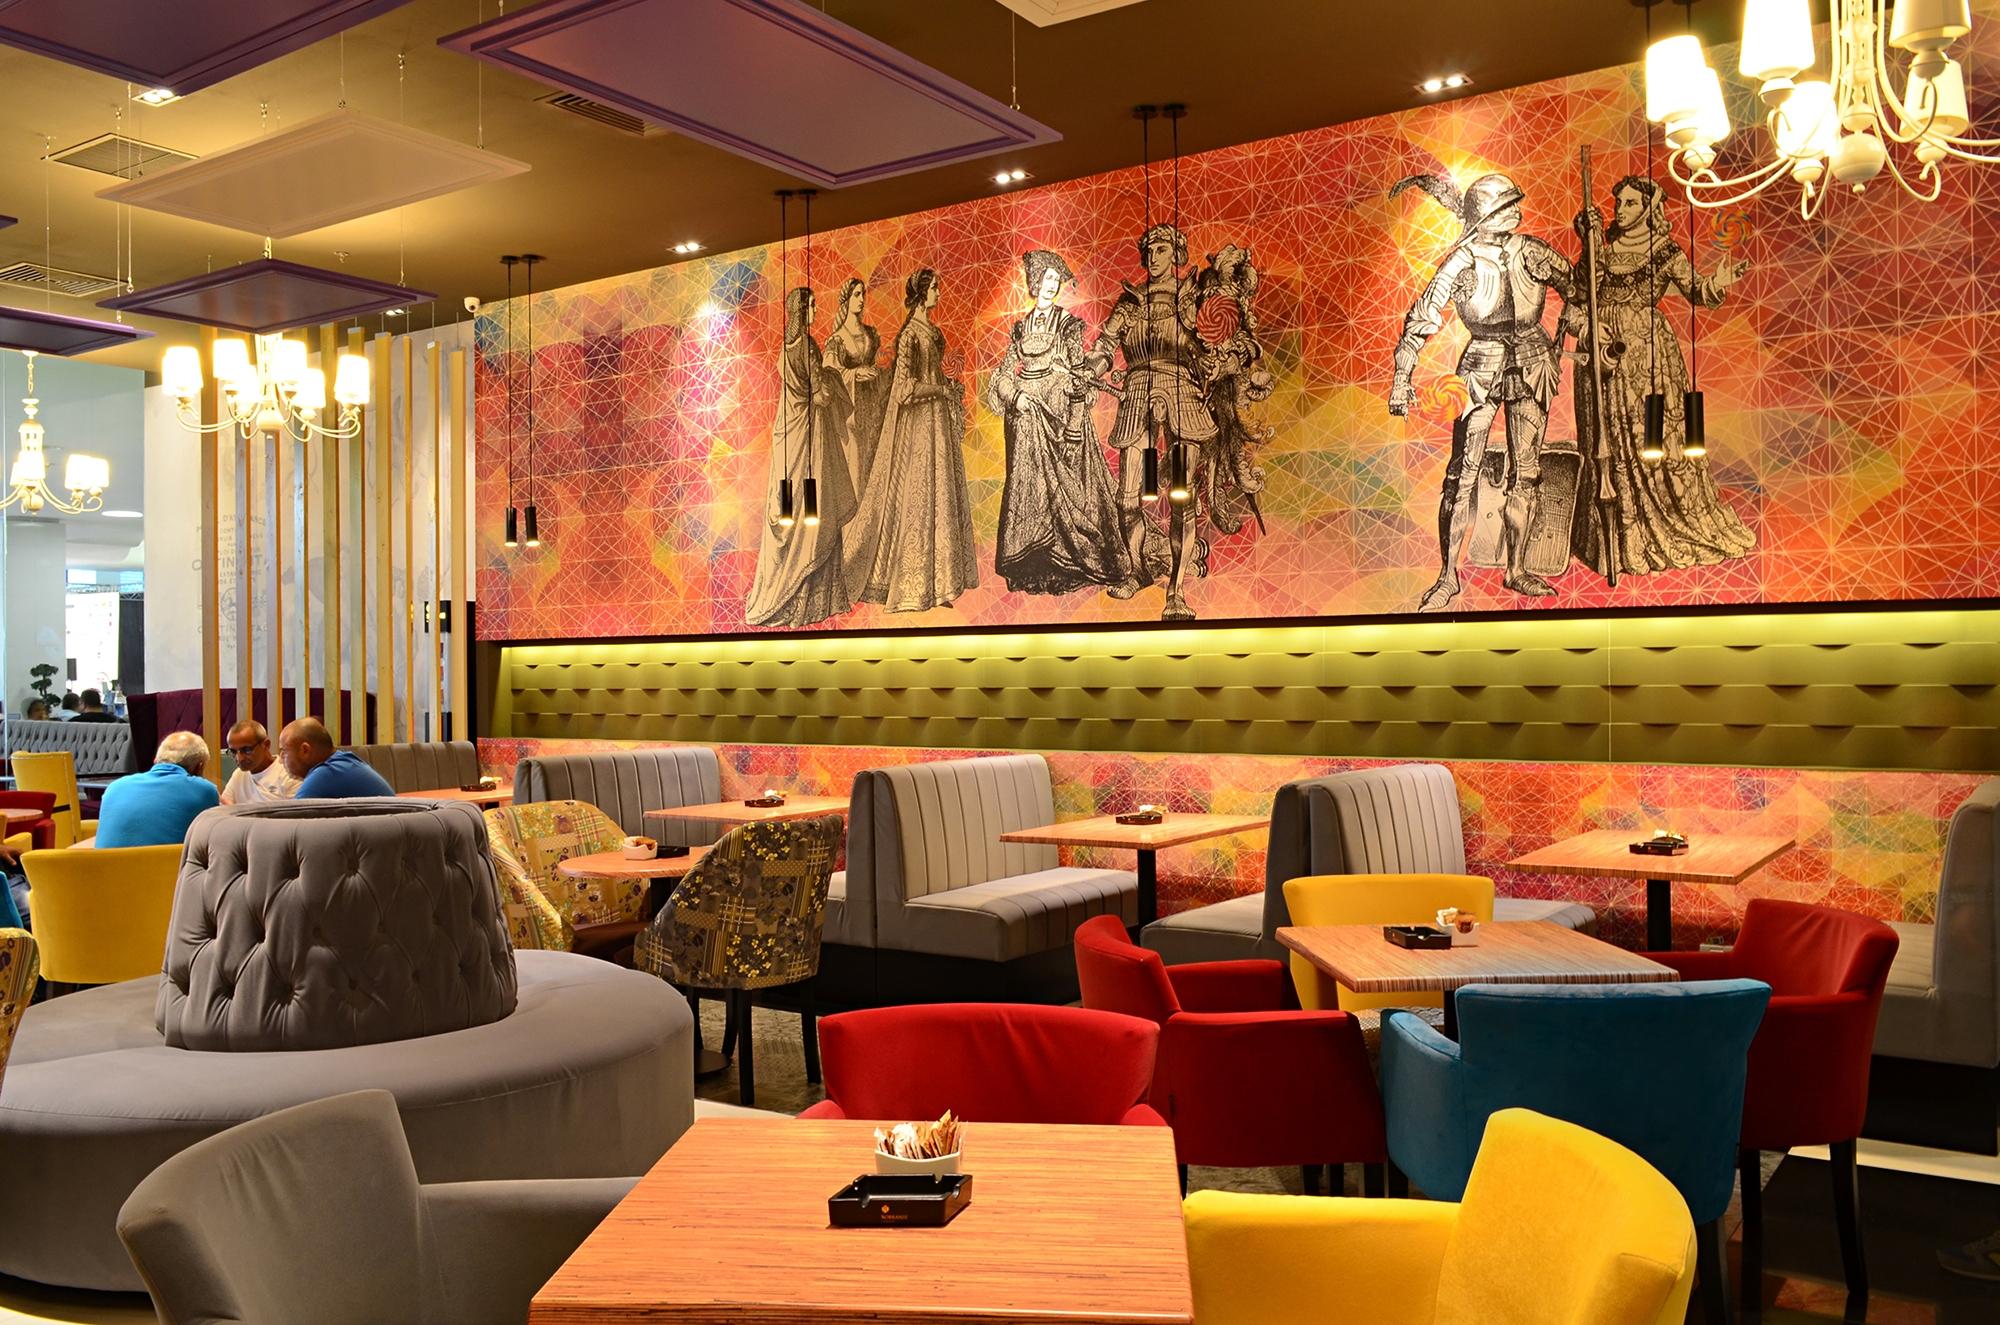 design interior restaurant lollypop